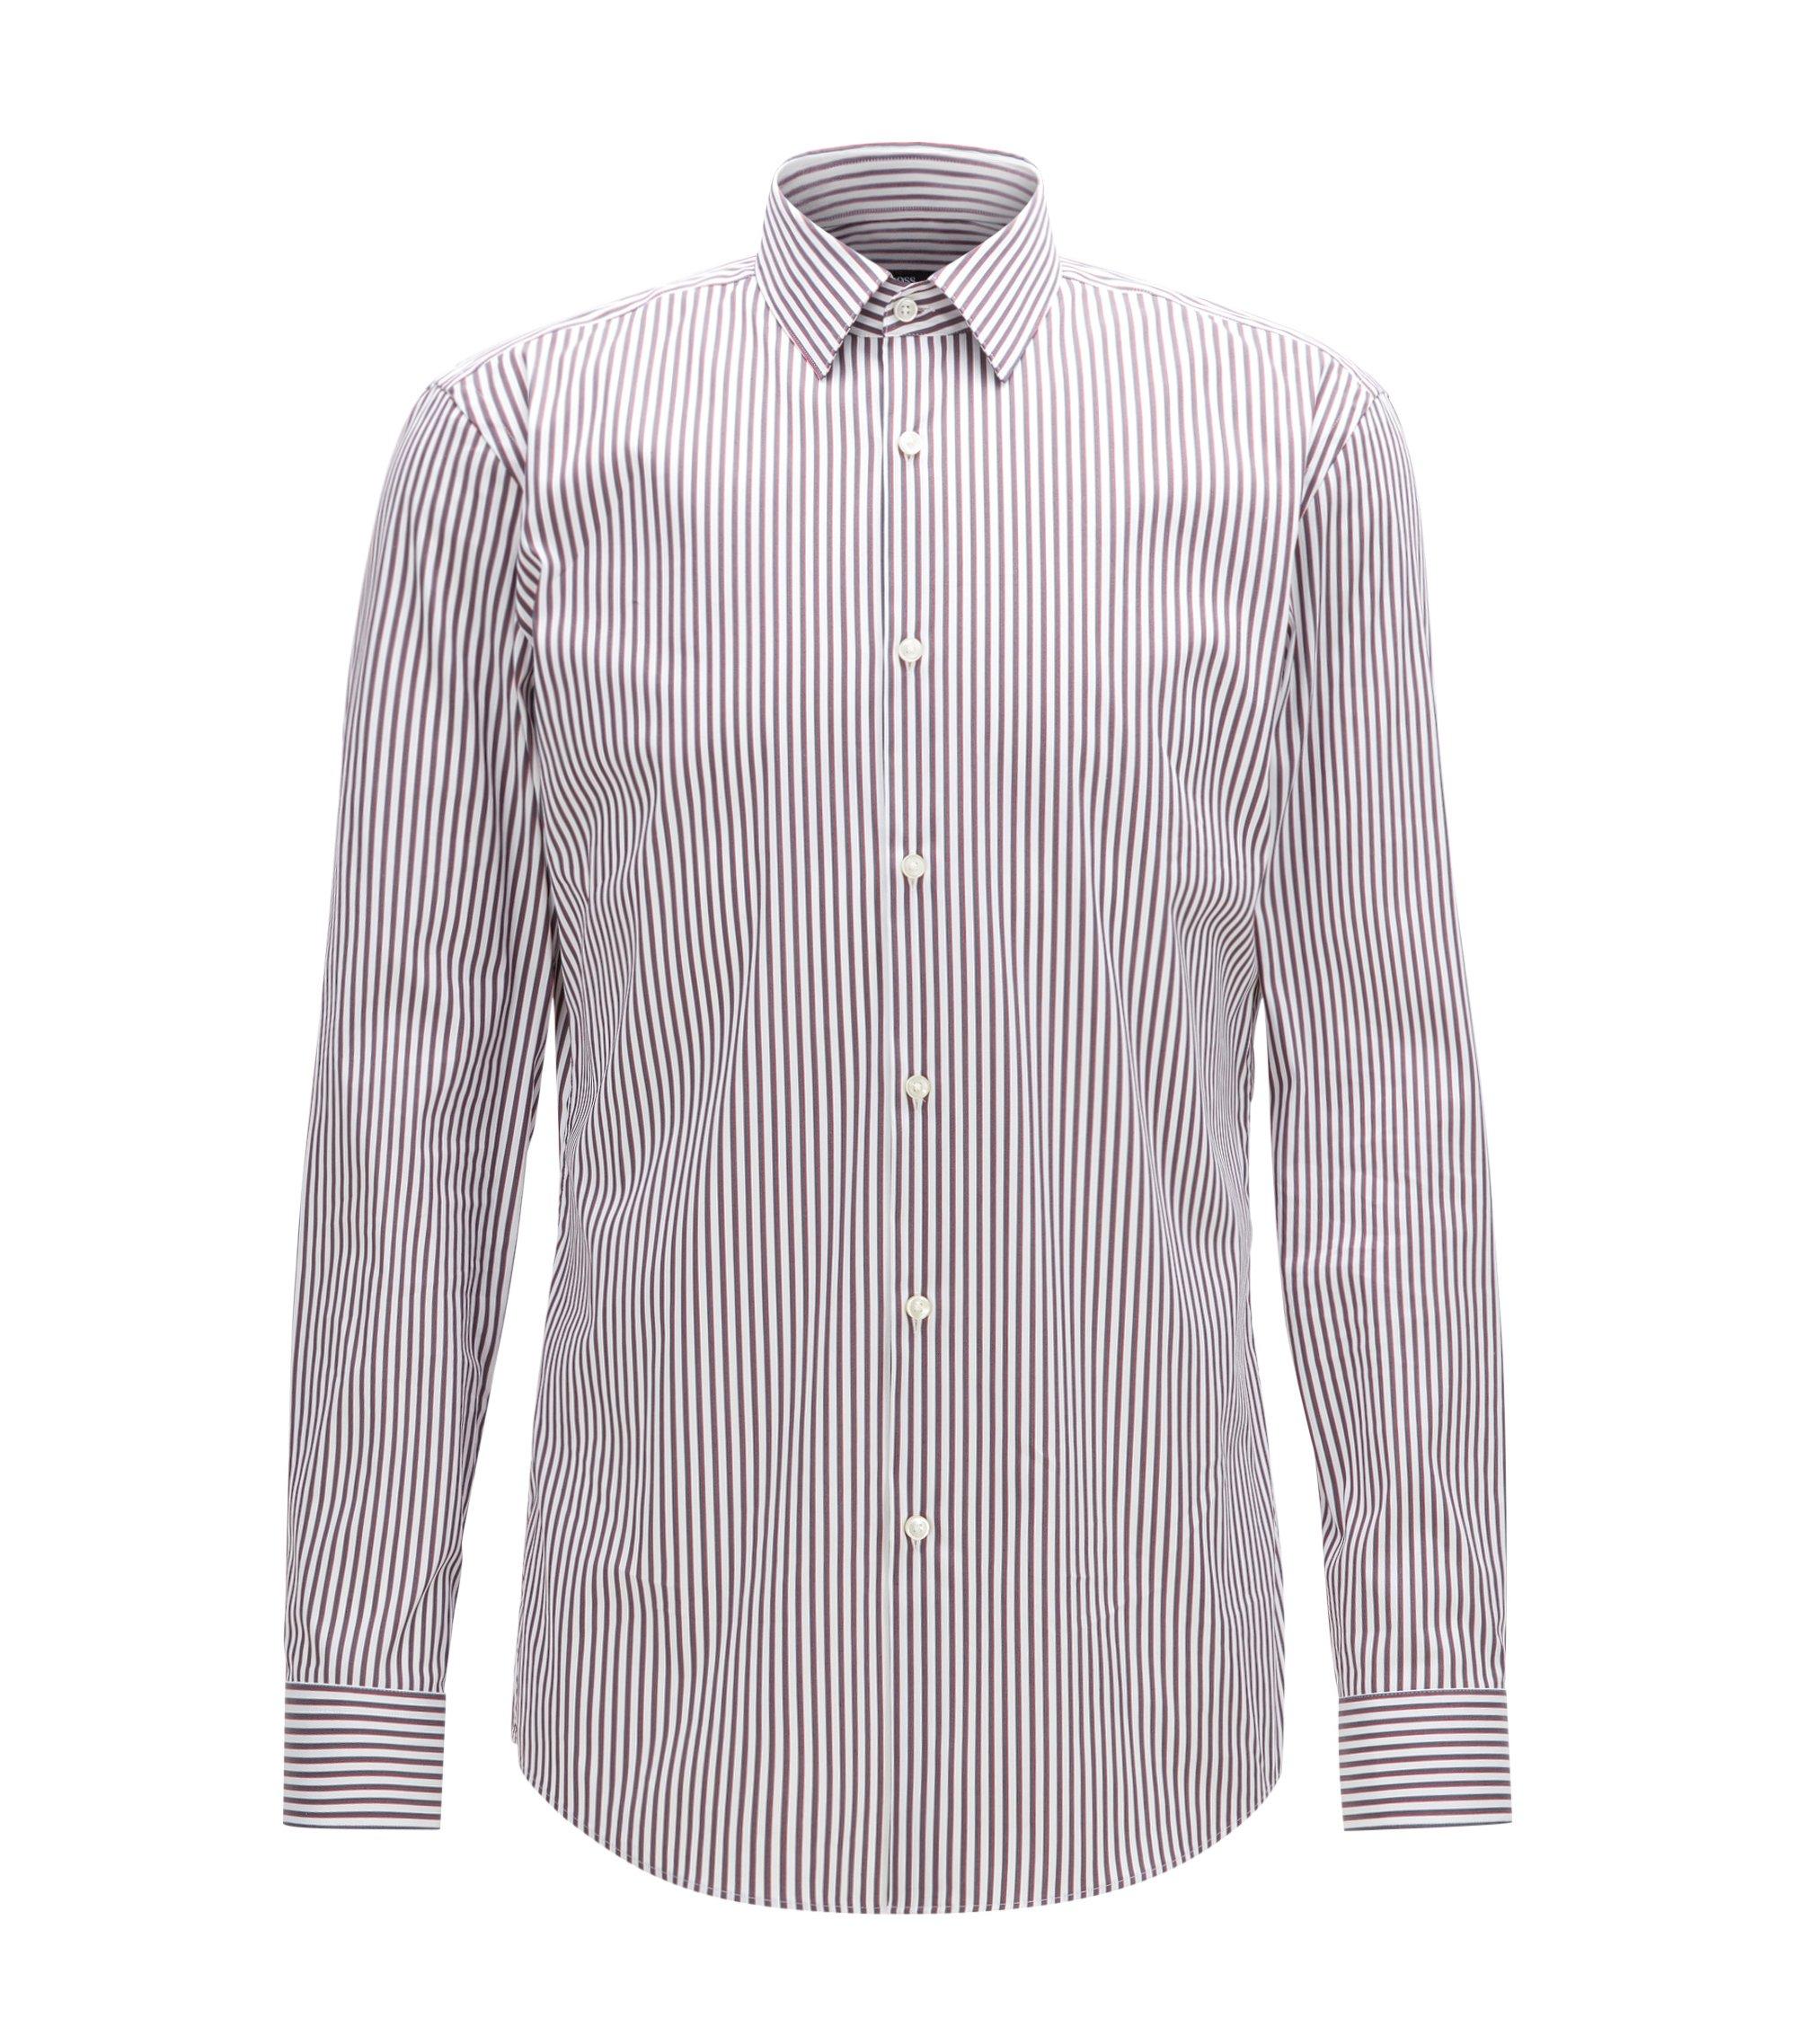 Striped Stretch Cotton Dress Shirt, Slim Fit | Isko, Red